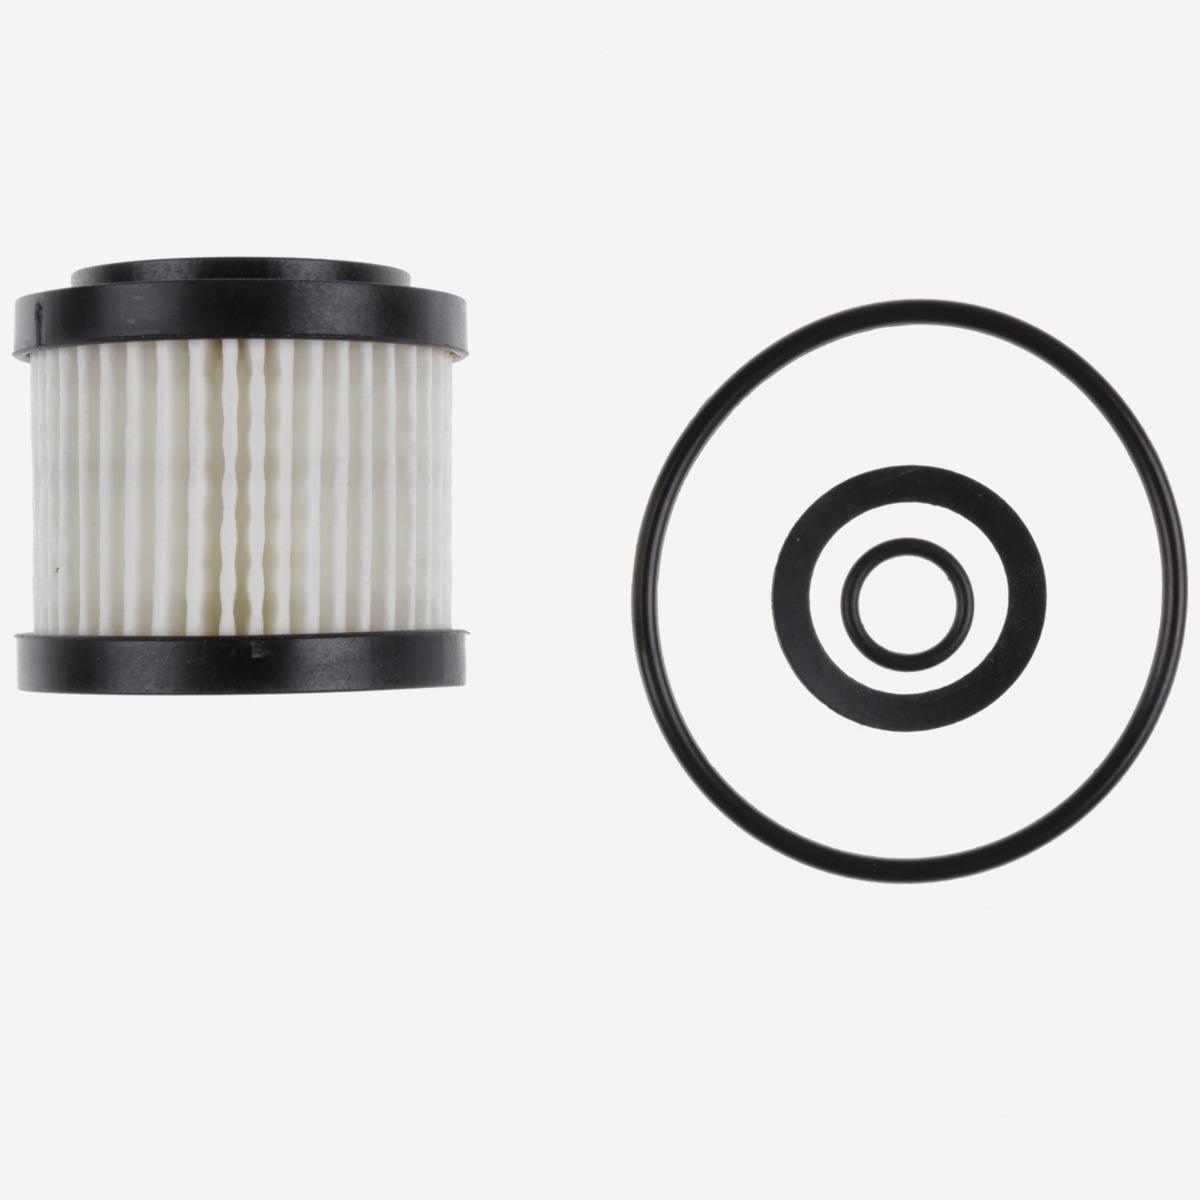 weishaupt filtereinsatz set 15 20 m wtc ow 15 a 46101130407. Black Bedroom Furniture Sets. Home Design Ideas